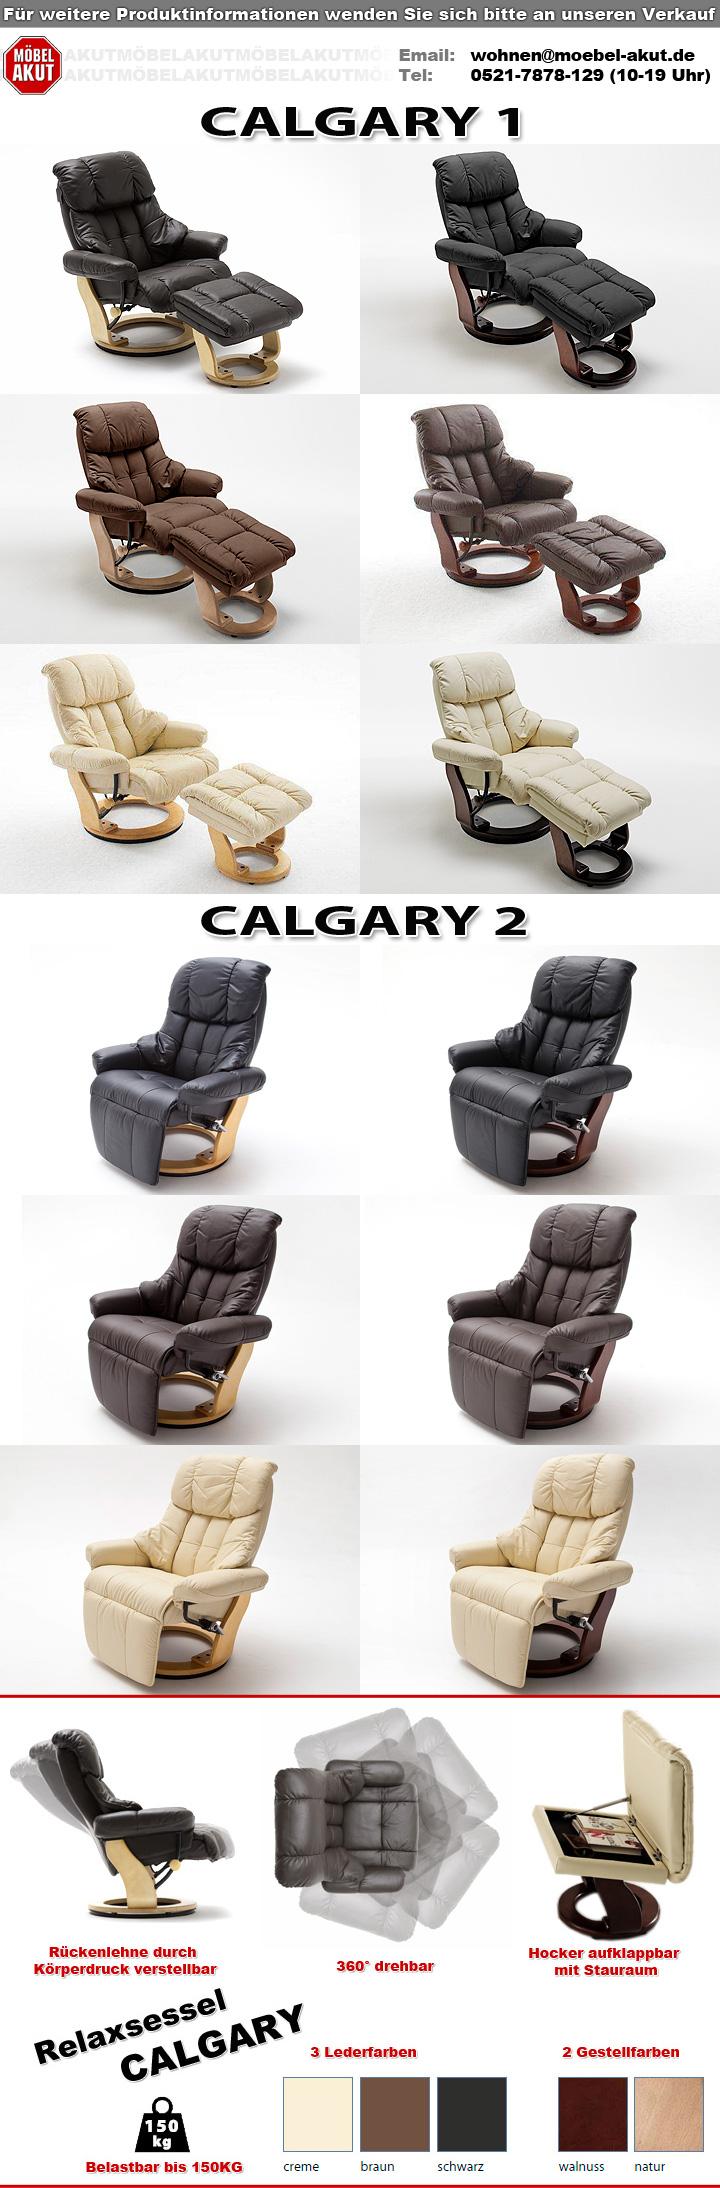 Calgary Sessel Beeindruckend Mca Relaxsessel Calgary Xxl Tv Sessel